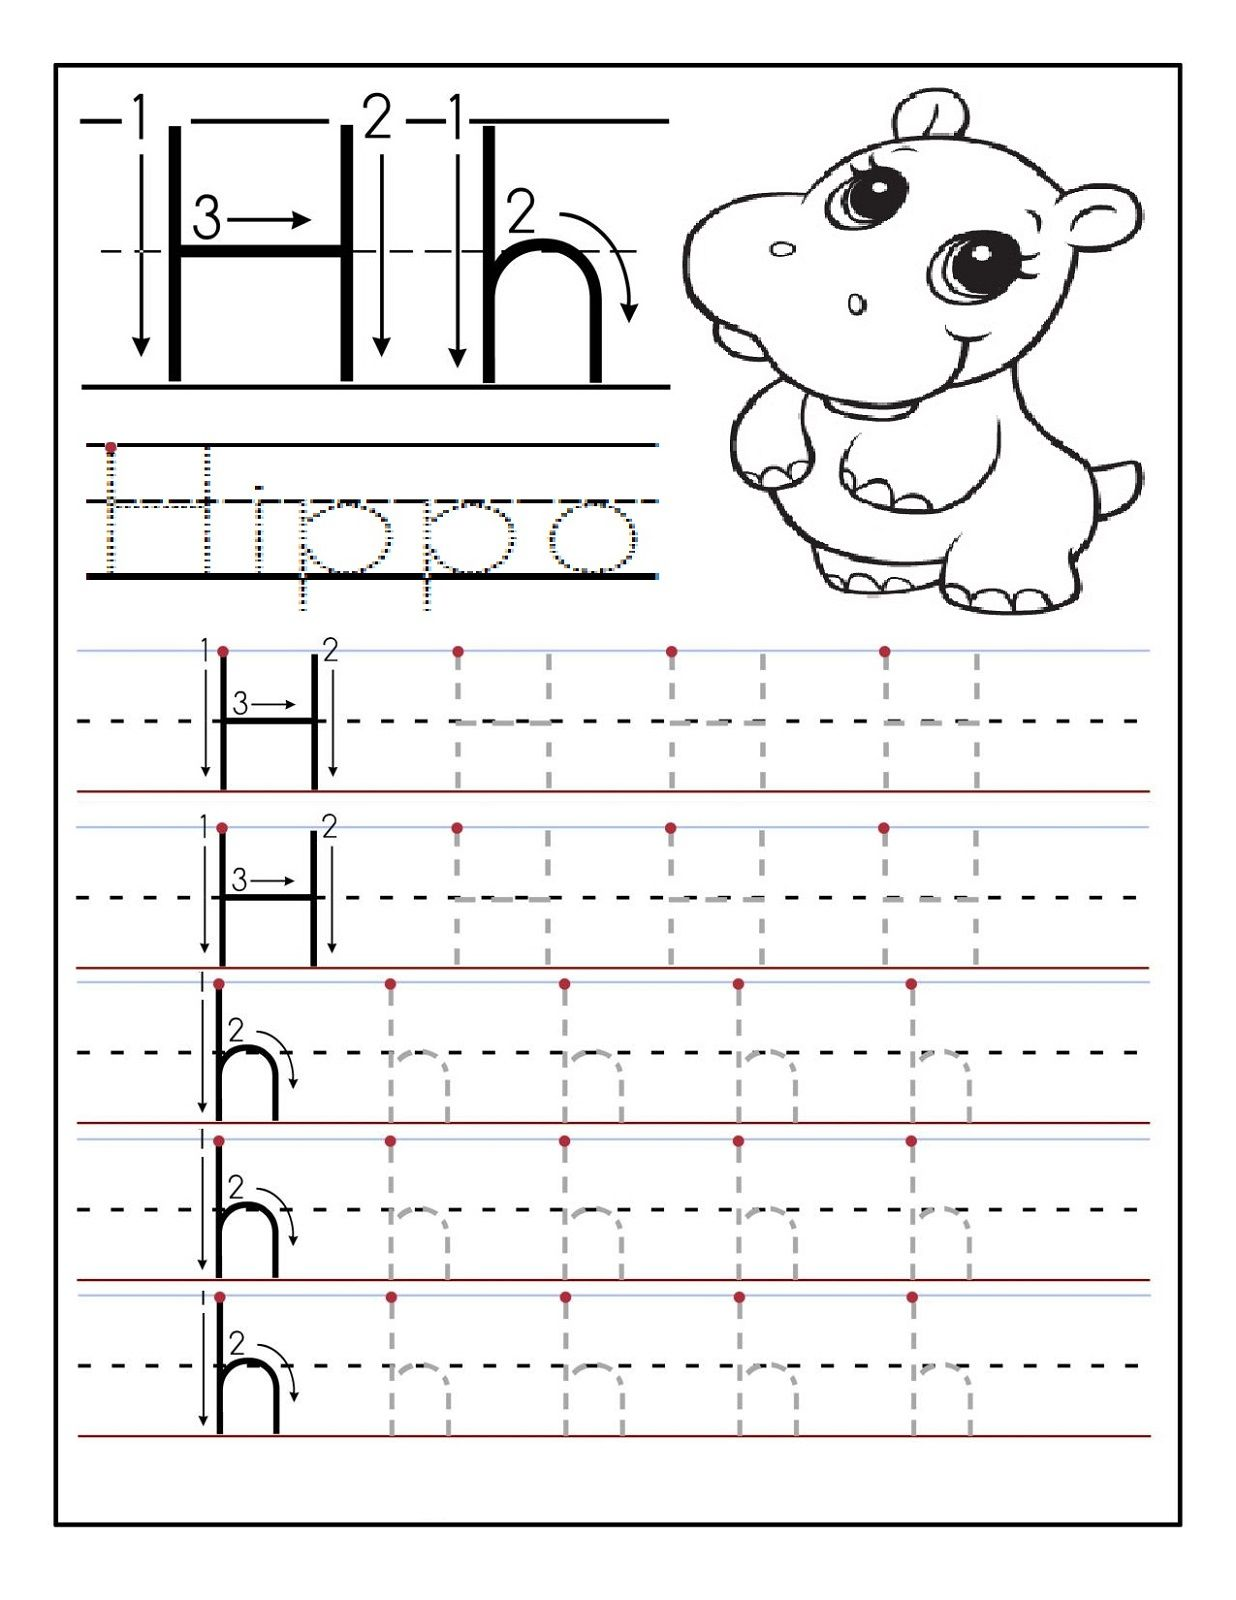 Preschool Alphabet Worksheets Alphabet Worksheets Preschool Tracing Worksheets Preschool Preschool Letters [ 1600 x 1236 Pixel ]